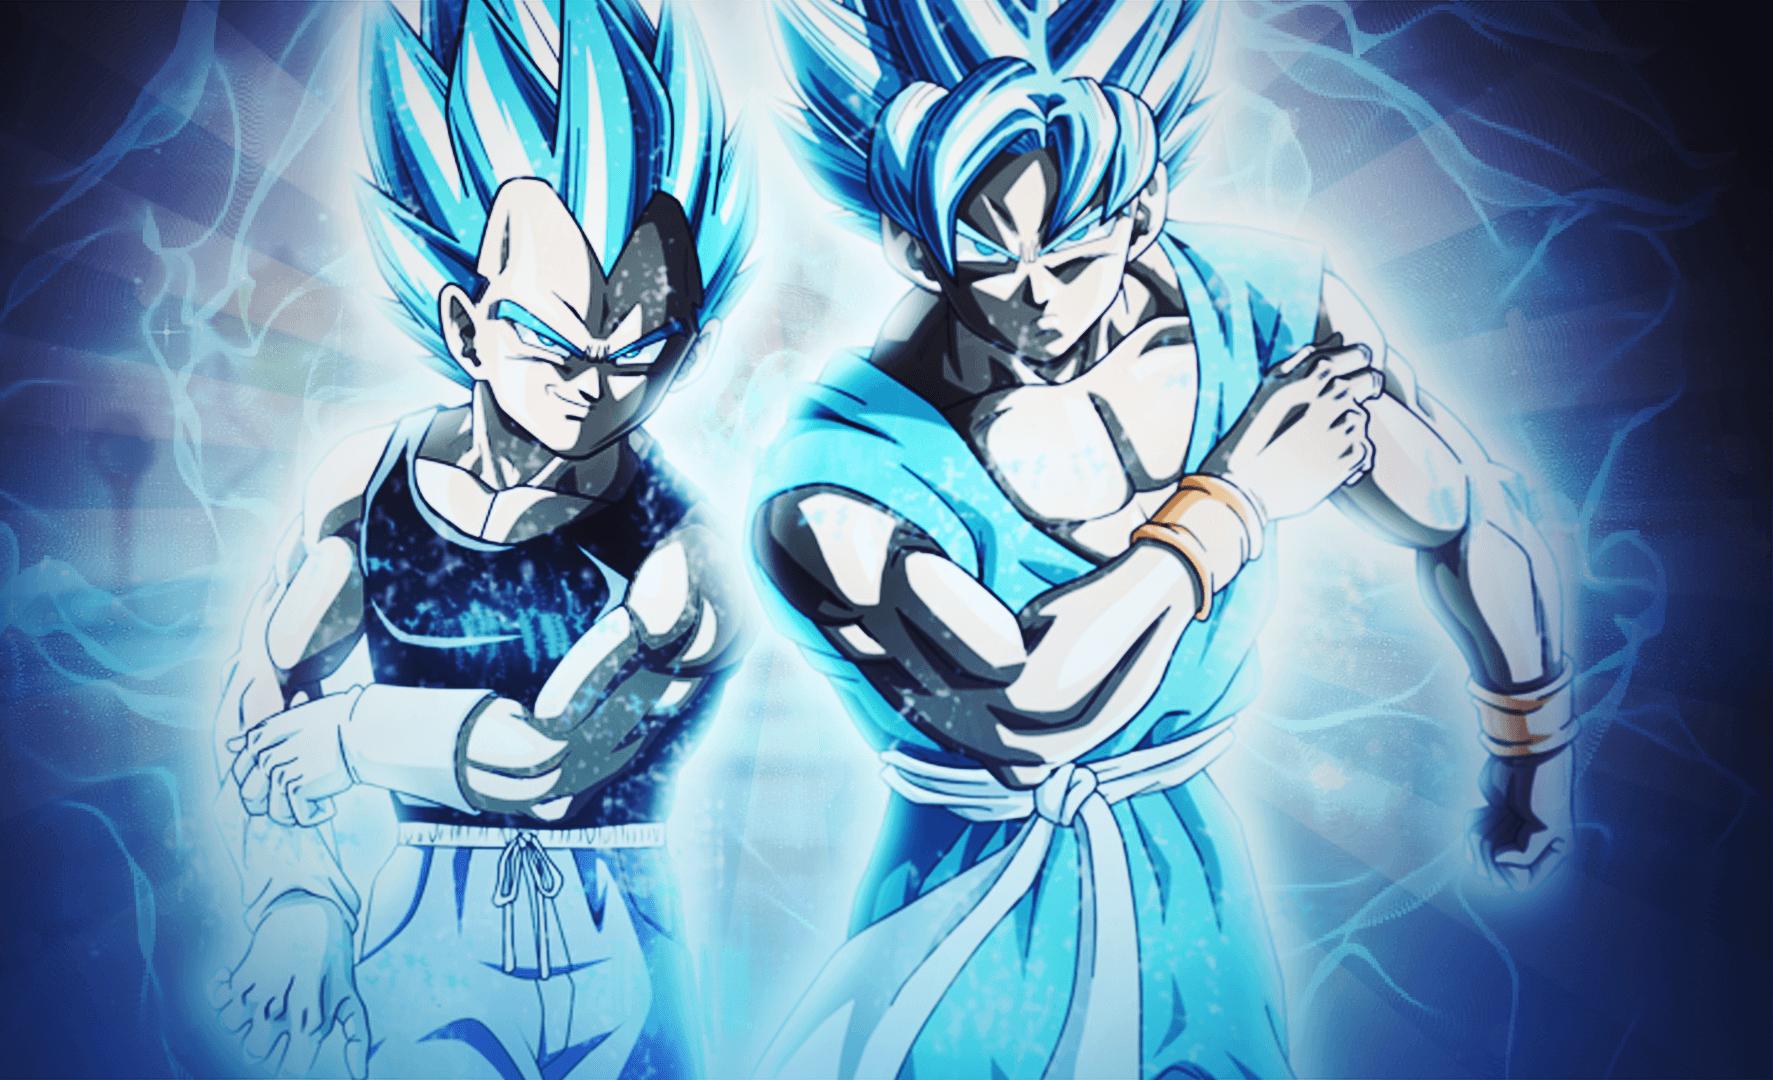 Blue Super Saiyan Goku Wallpapers Top Free Blue Super